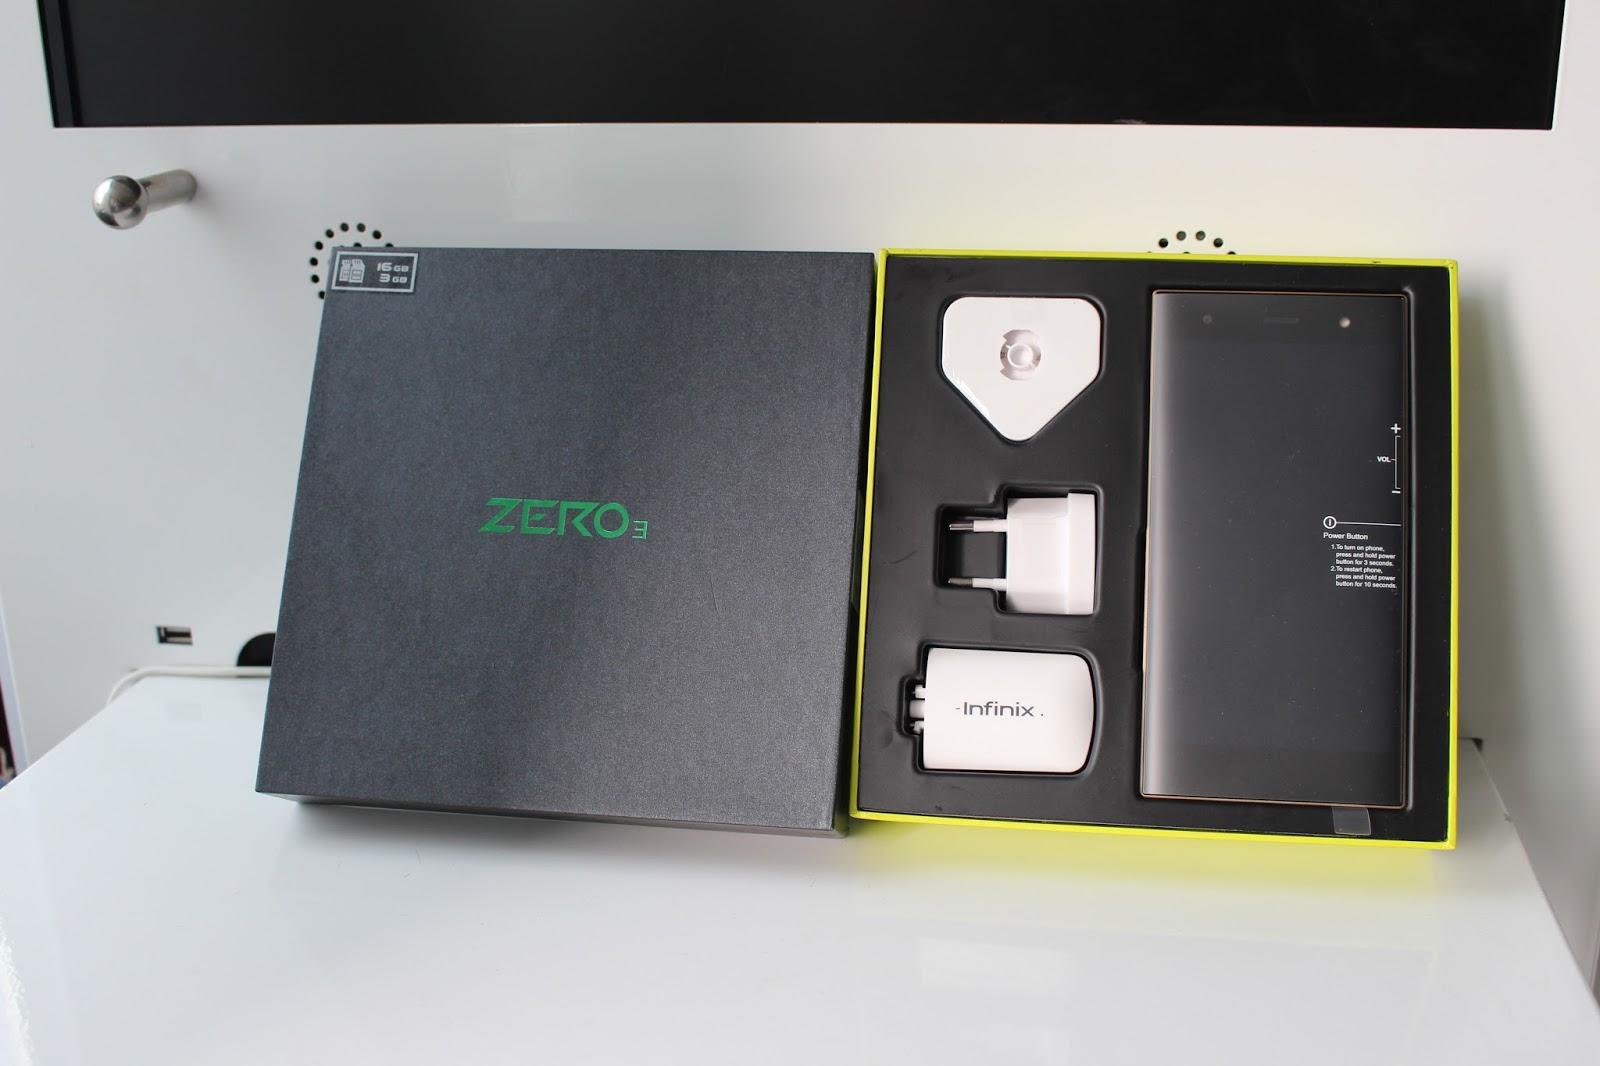 Infinix Zero 3 with Accessories